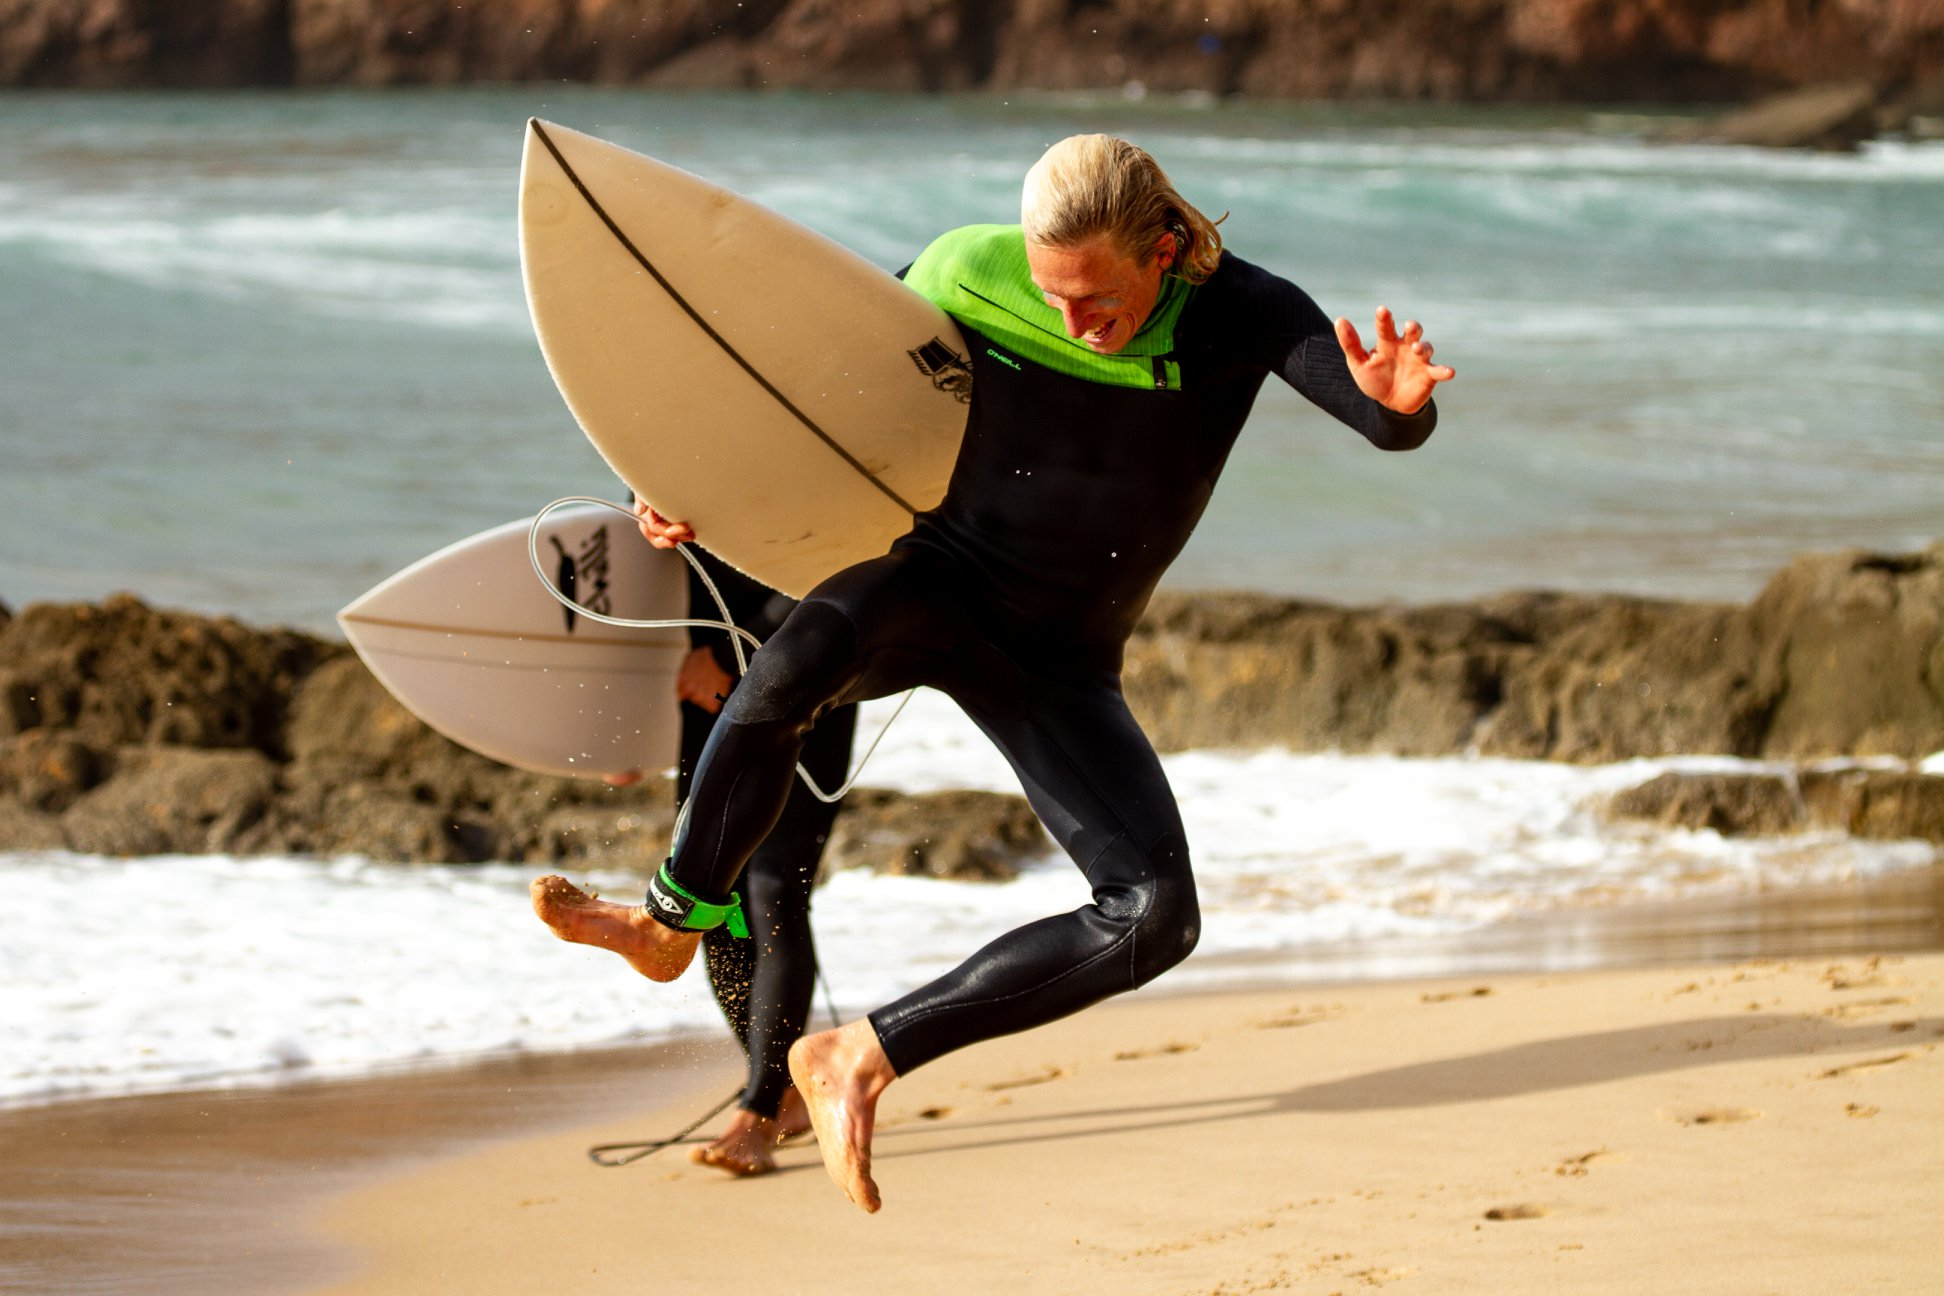 surfguide algarve stoked